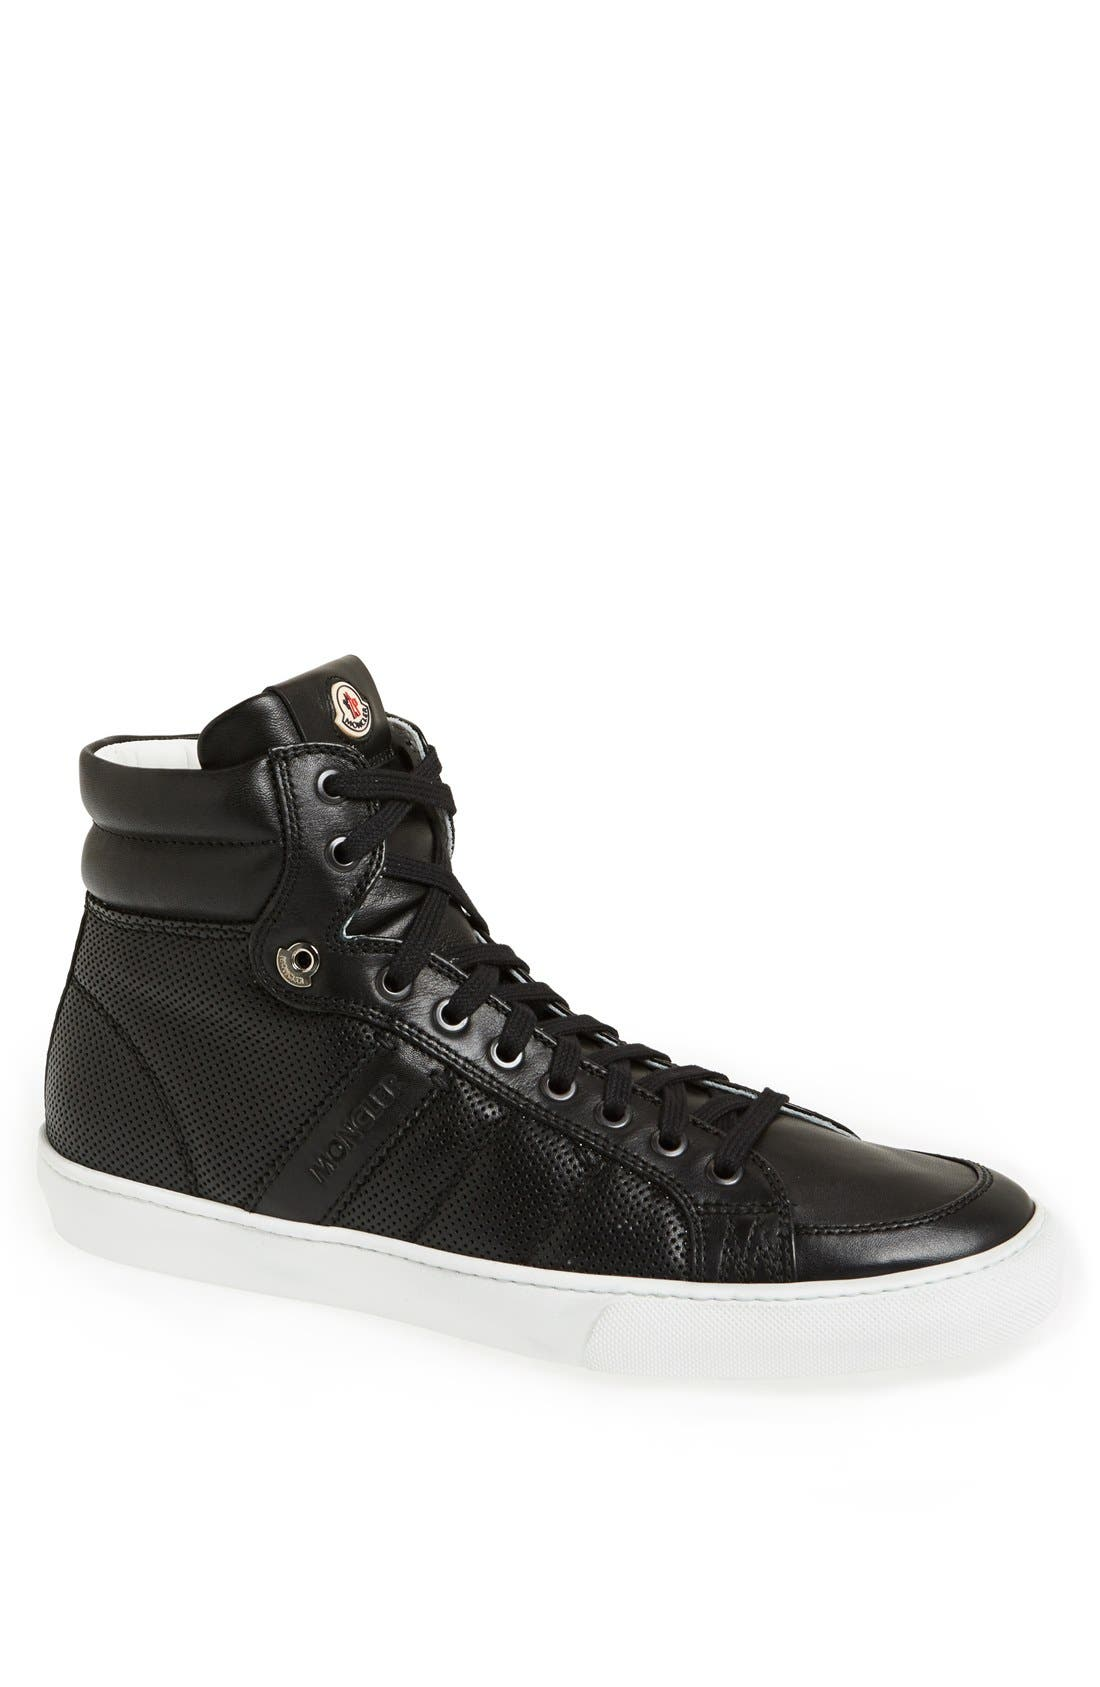 Alternate Image 1 Selected - Moncler 'Lyon' Sneaker (Men)